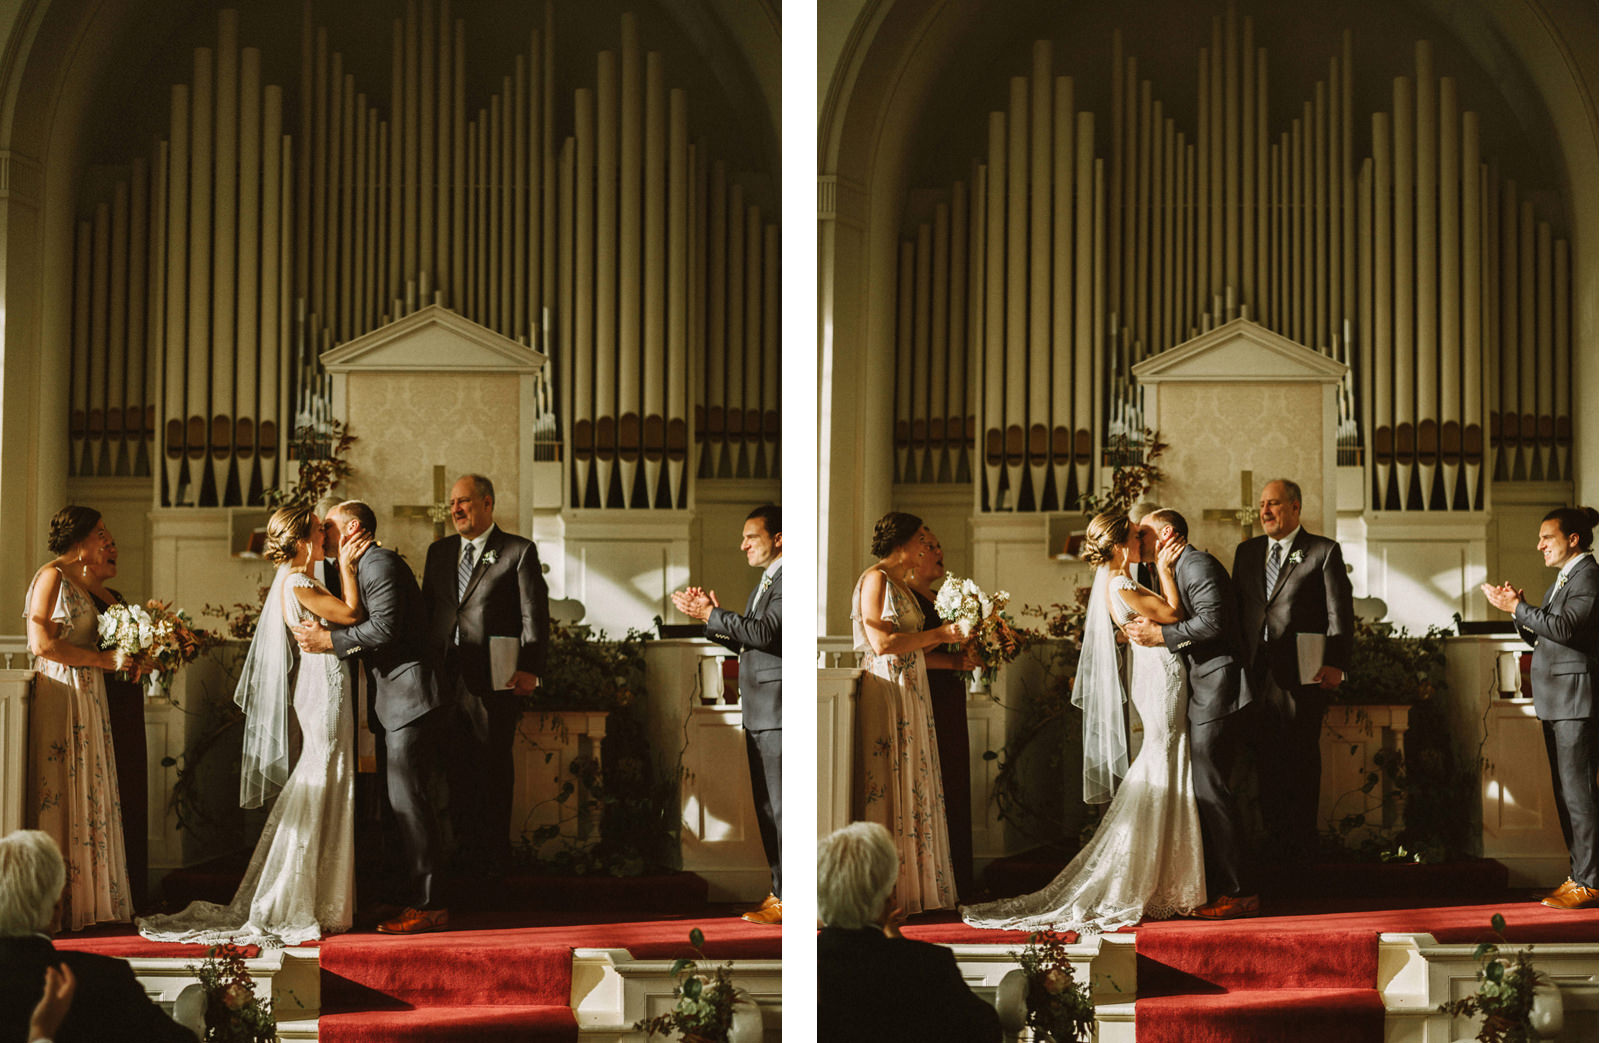 bridgeport-wedding-078 BRIDGEPORT, CONNECTICUT BACKYARD WEDDING